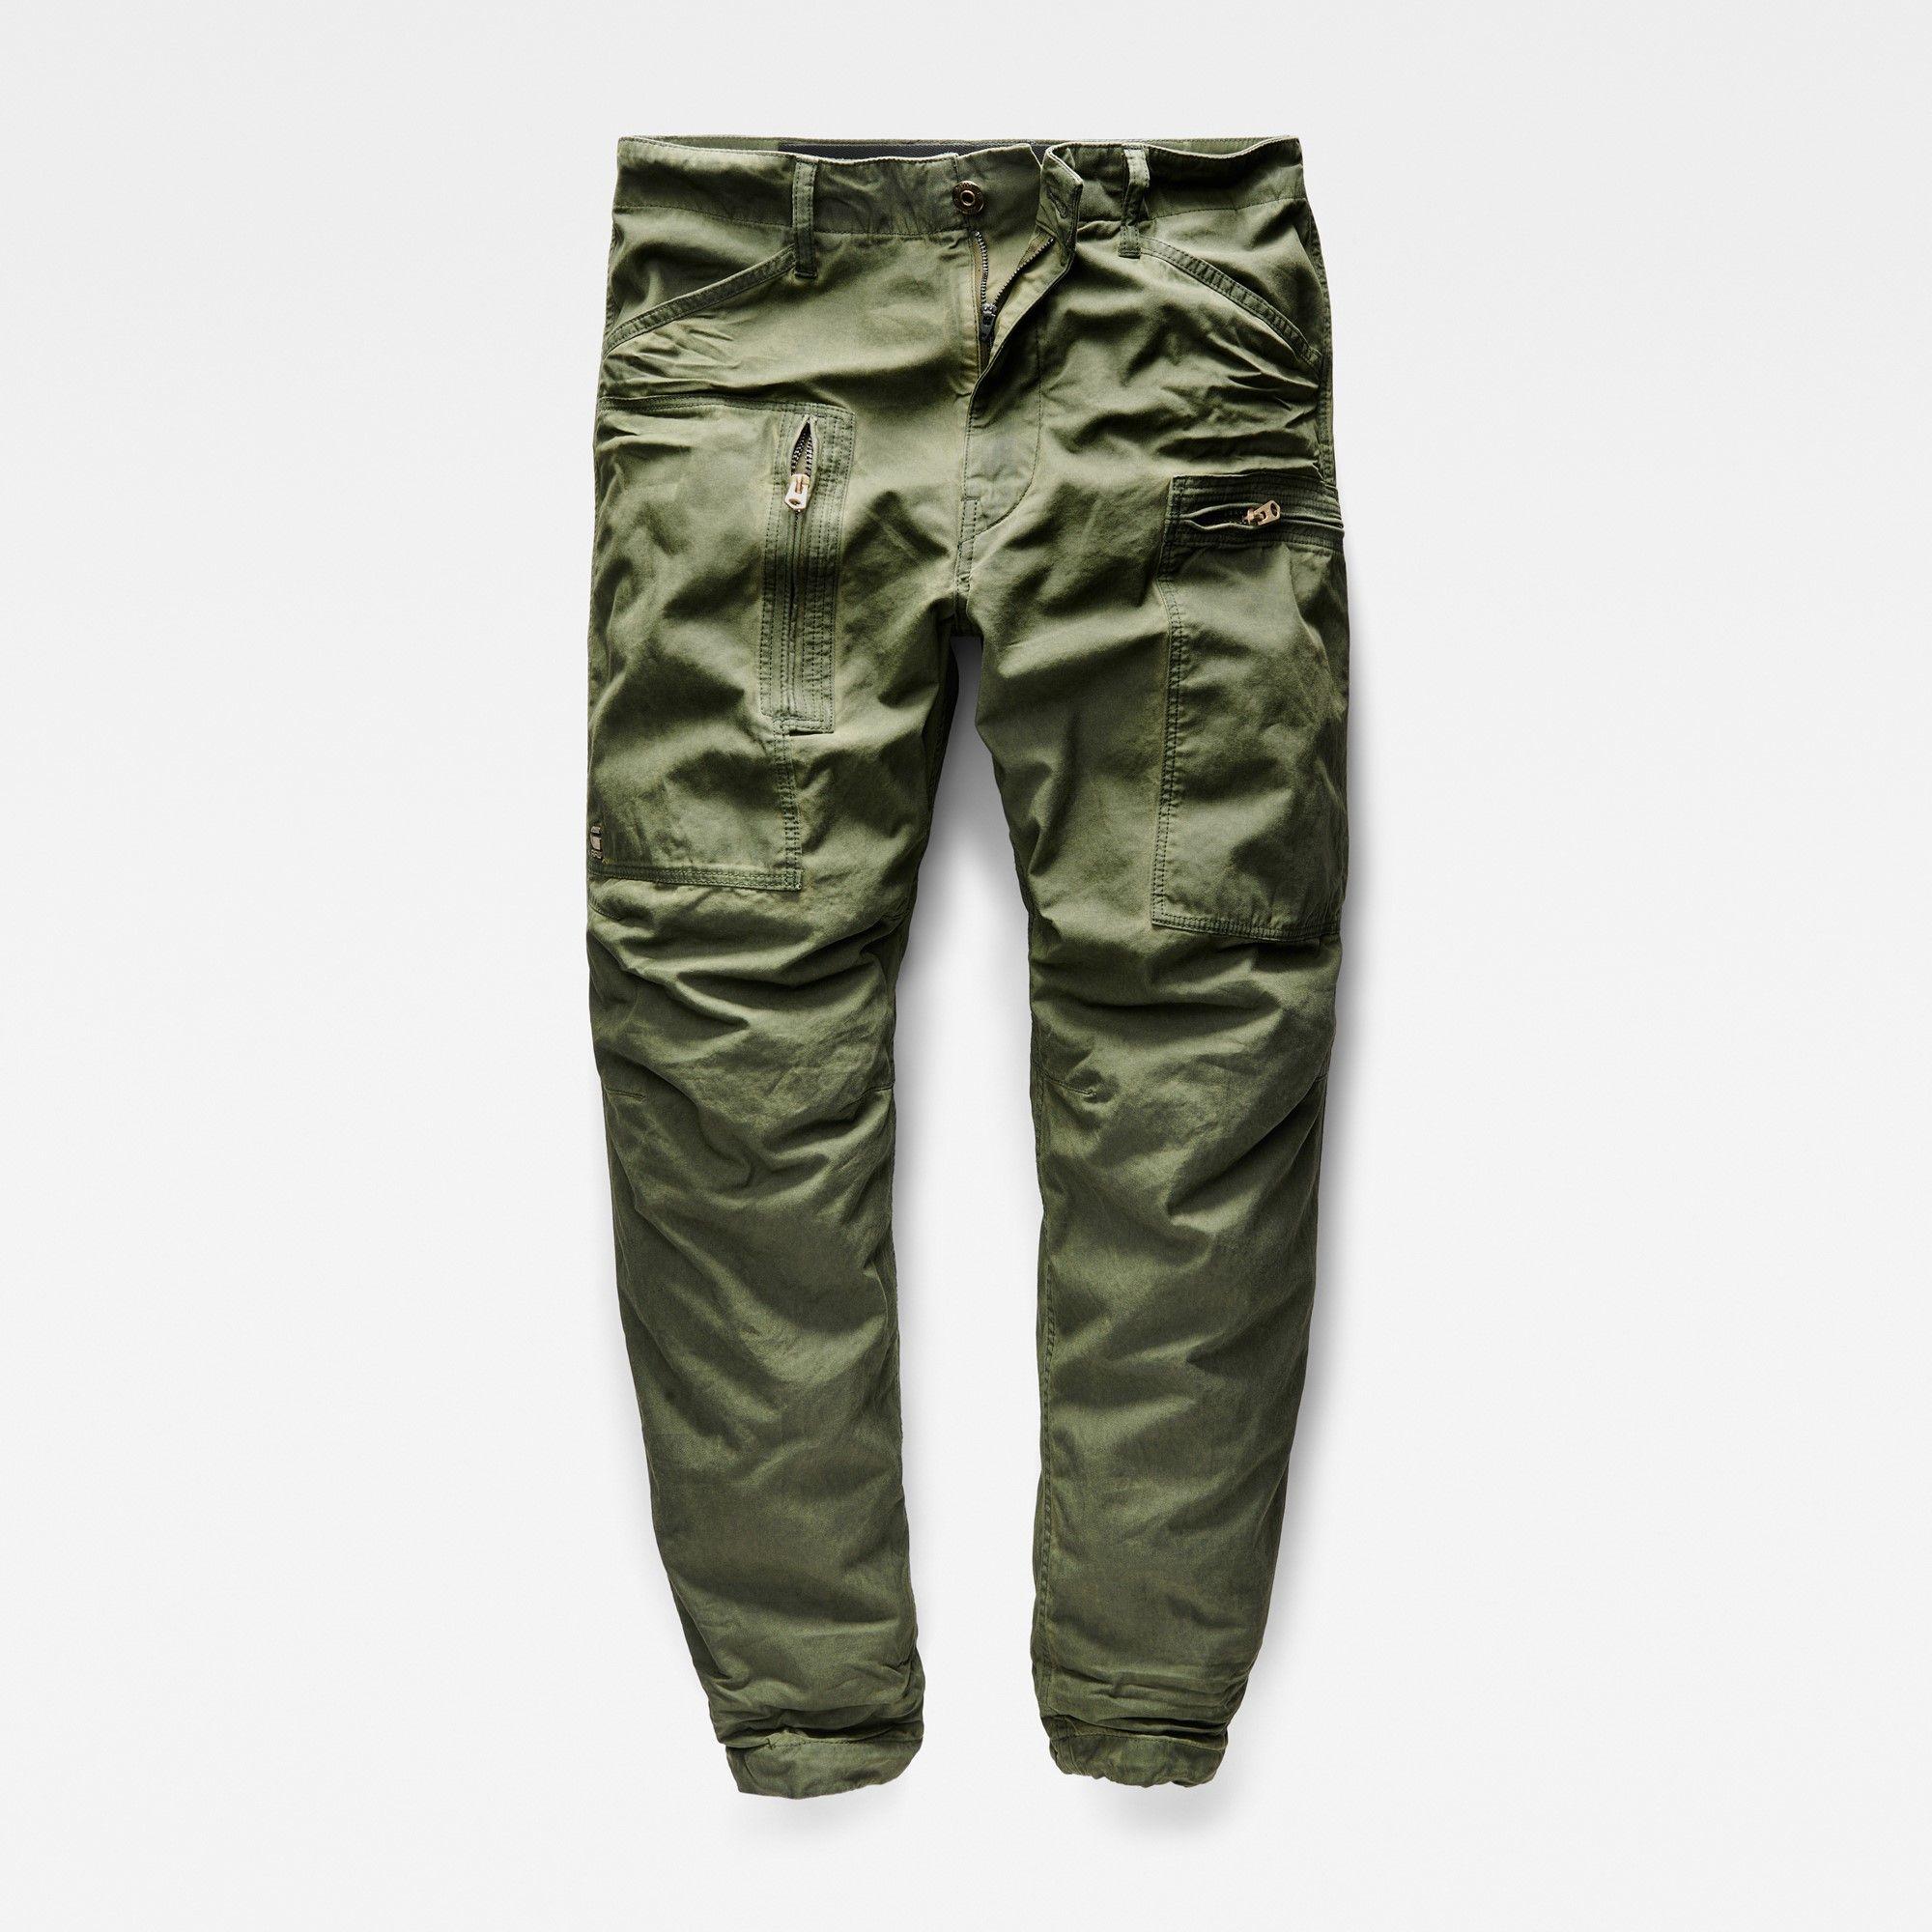 Mens Military Outdoors Multi Pocket Camo Print Cargo Shorts Beach Capri Pants Size 29 38 2 Colors Available B01CNP4IJ8